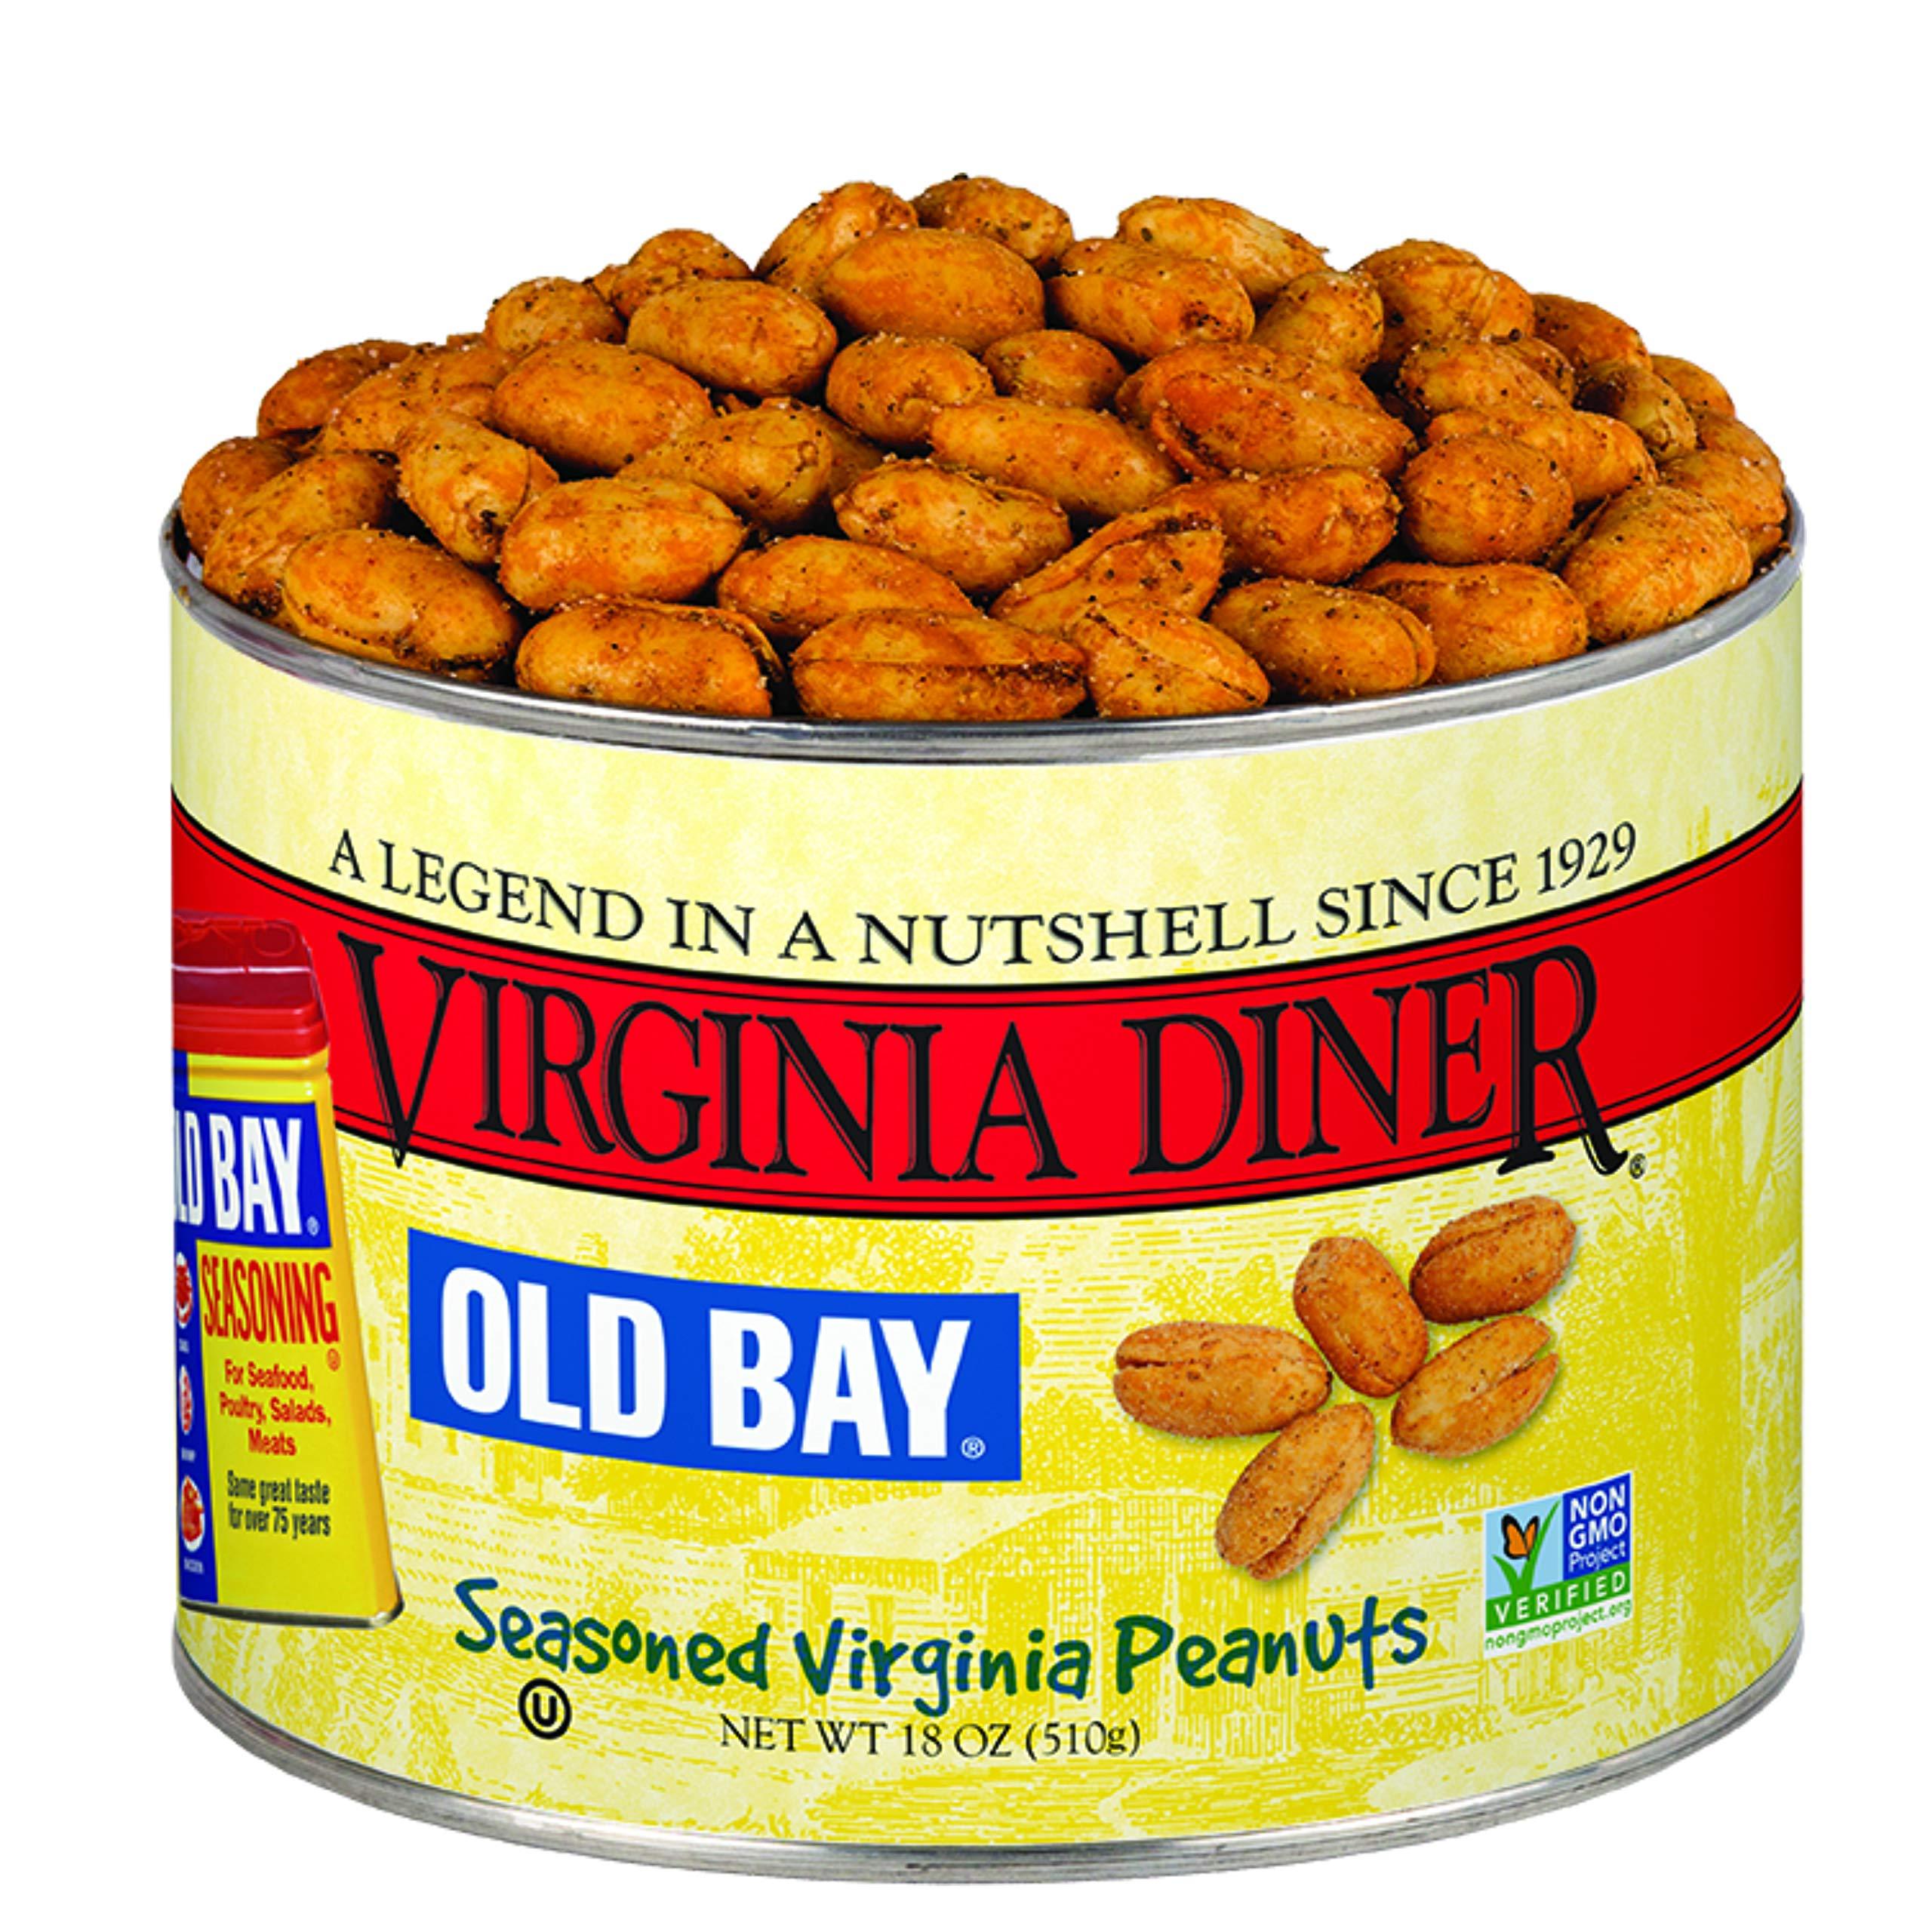 Virginia Diner Peanuts, Old Bay Seasoned, 18-Ounce by Virginia Diner